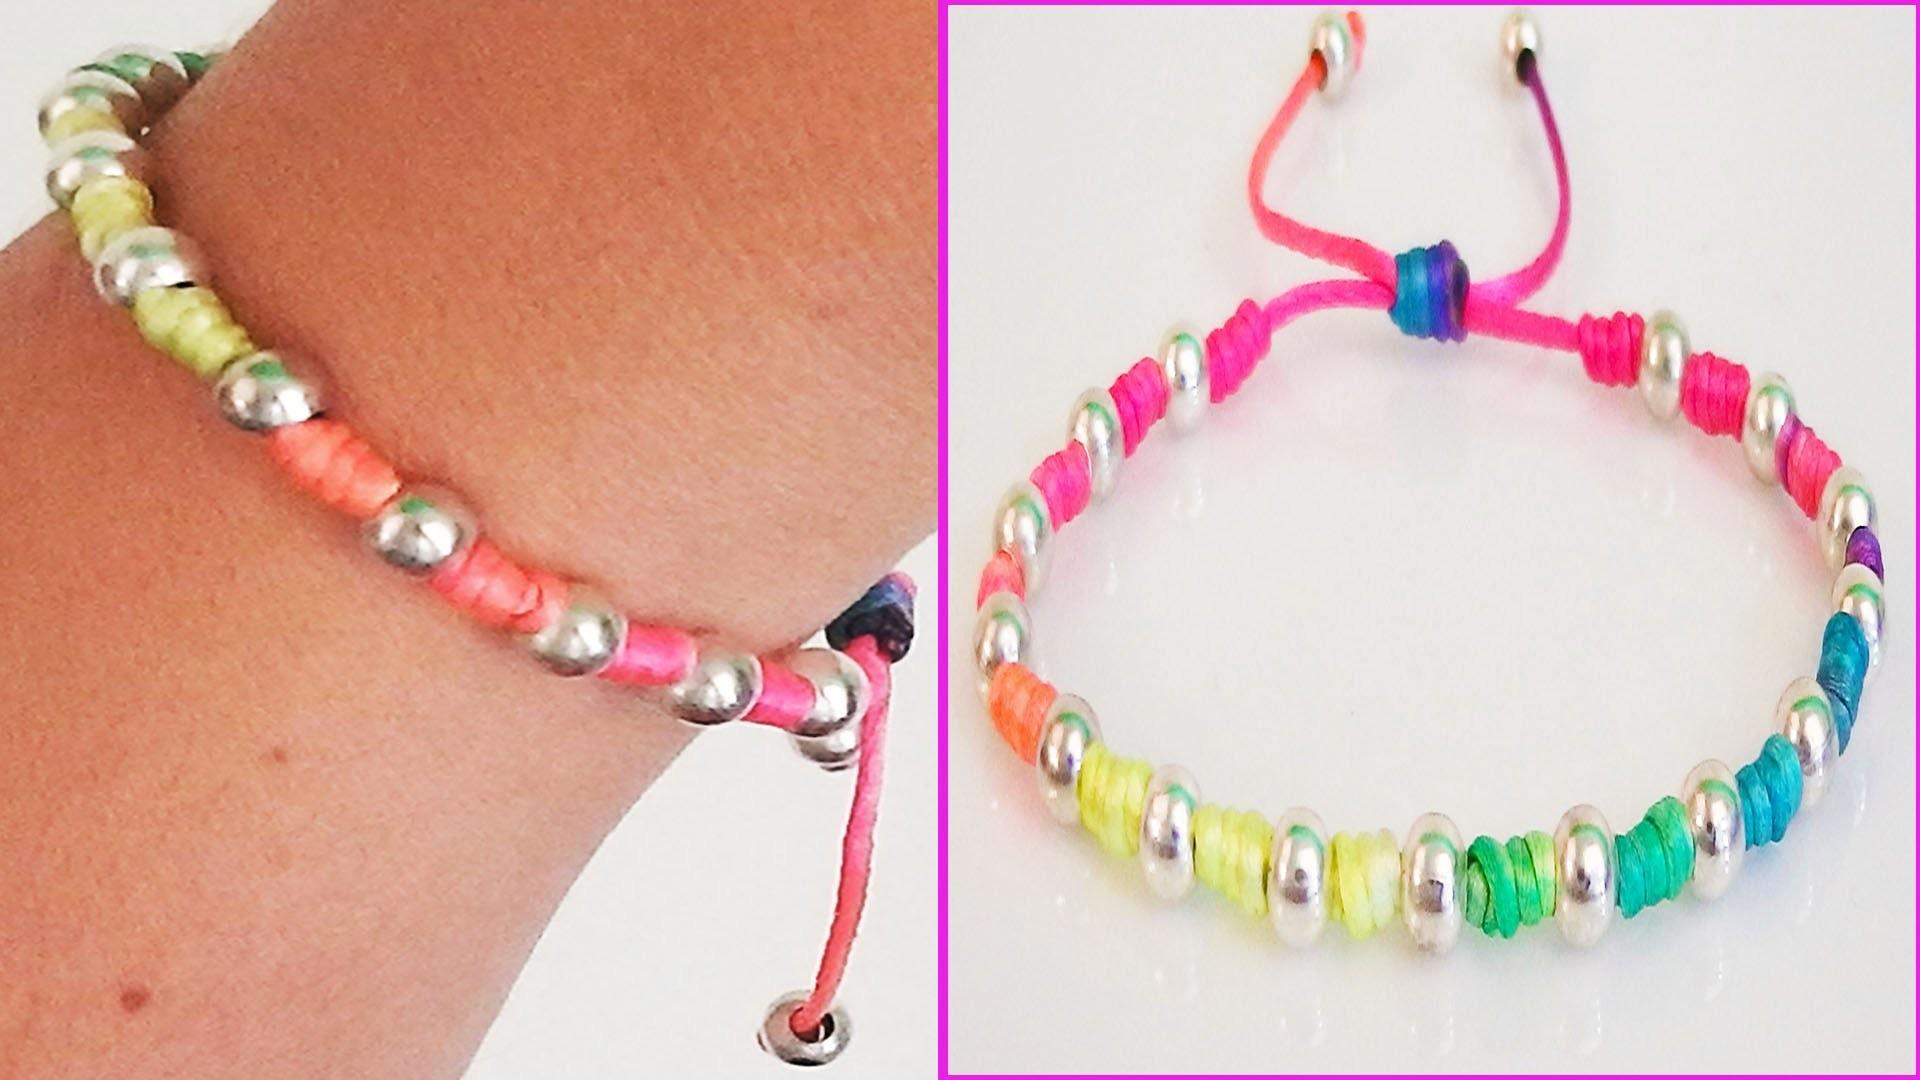 diy bracelets with beads with string friendship bracelets